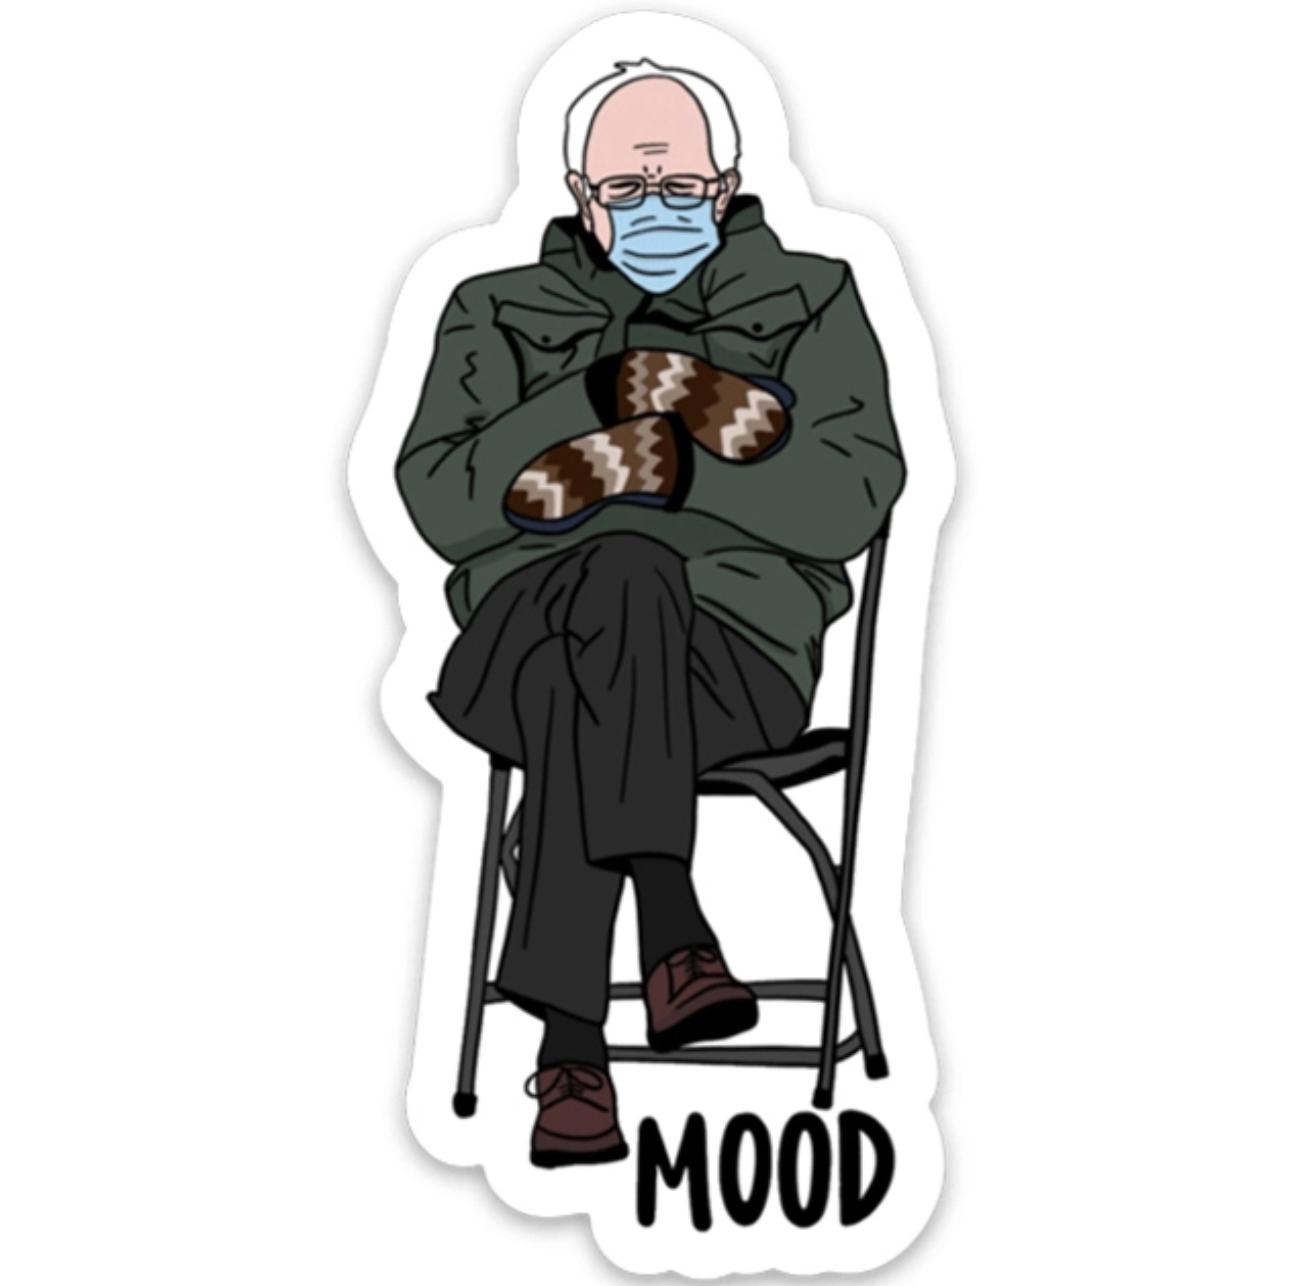 Brittany Paige Bernie Sanders Mood Sticker